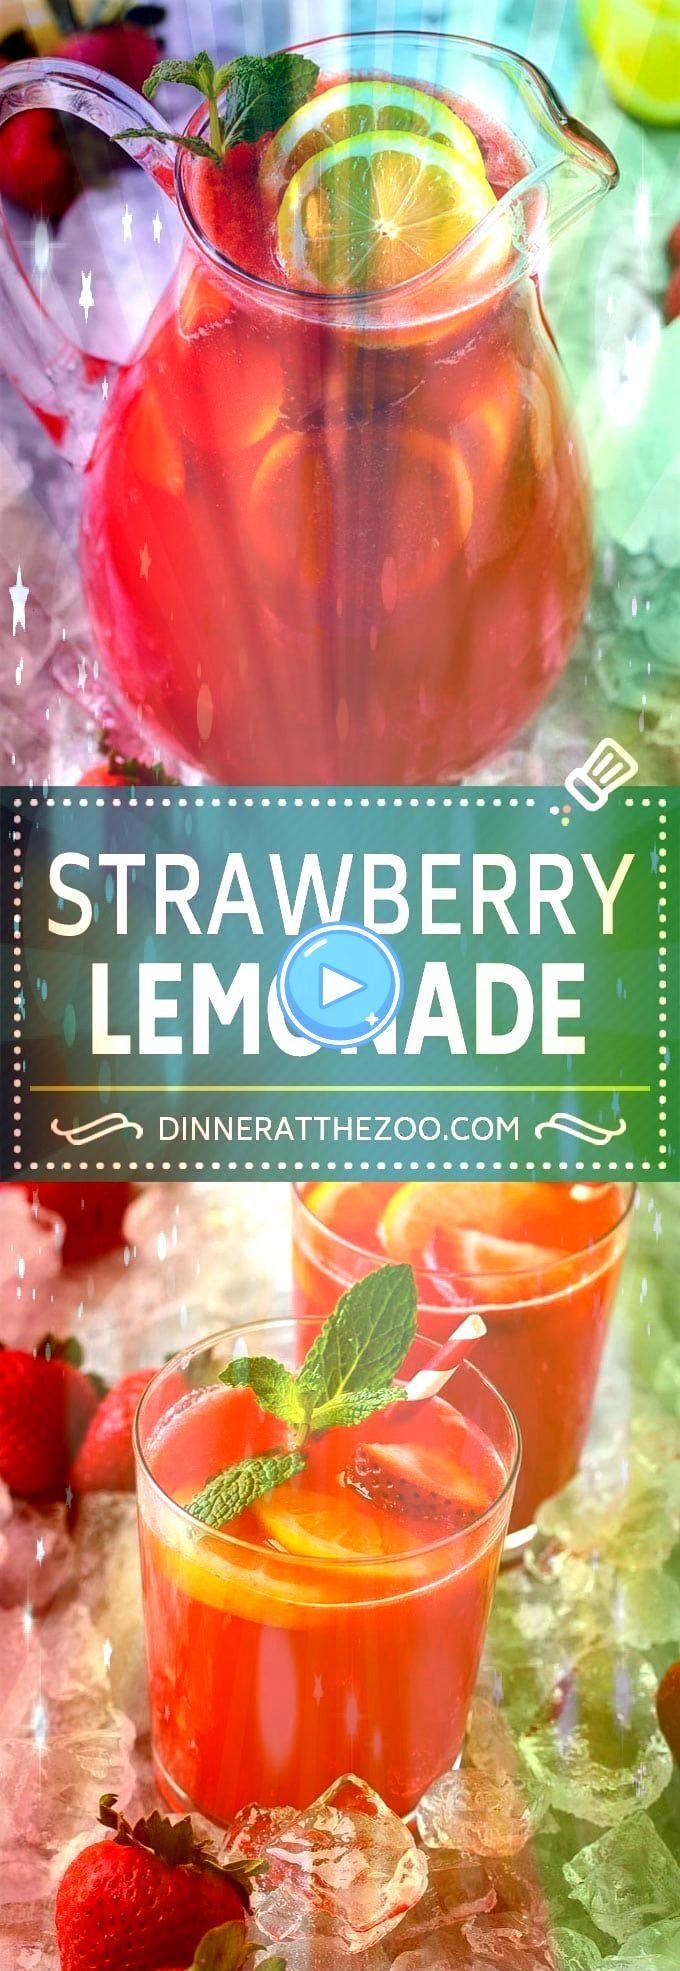 #strawberrylemonaderecipes #dinneratthezoo #strawberries #strawberry #lemonade #homemade #recipe #drinkStrawberry Lemonade Recipe | Homemade Lemonade | Strawberry Drink Recipe Strawberry Lemonade Recipe | Homemade Lemonade | Strawberry Drink RecipeStrawberry Lemonade Recipe | Homemade Lemonade | Strawberry Drink Recipe Strawberry Lemonade Recipe | Homemade Lemonade | Strawberry Drink Recipe  How to make Frozen Strawberry Lemonade  This is hands down the best recipe for making a Strawberry... #be #homemadelemonaderecipes